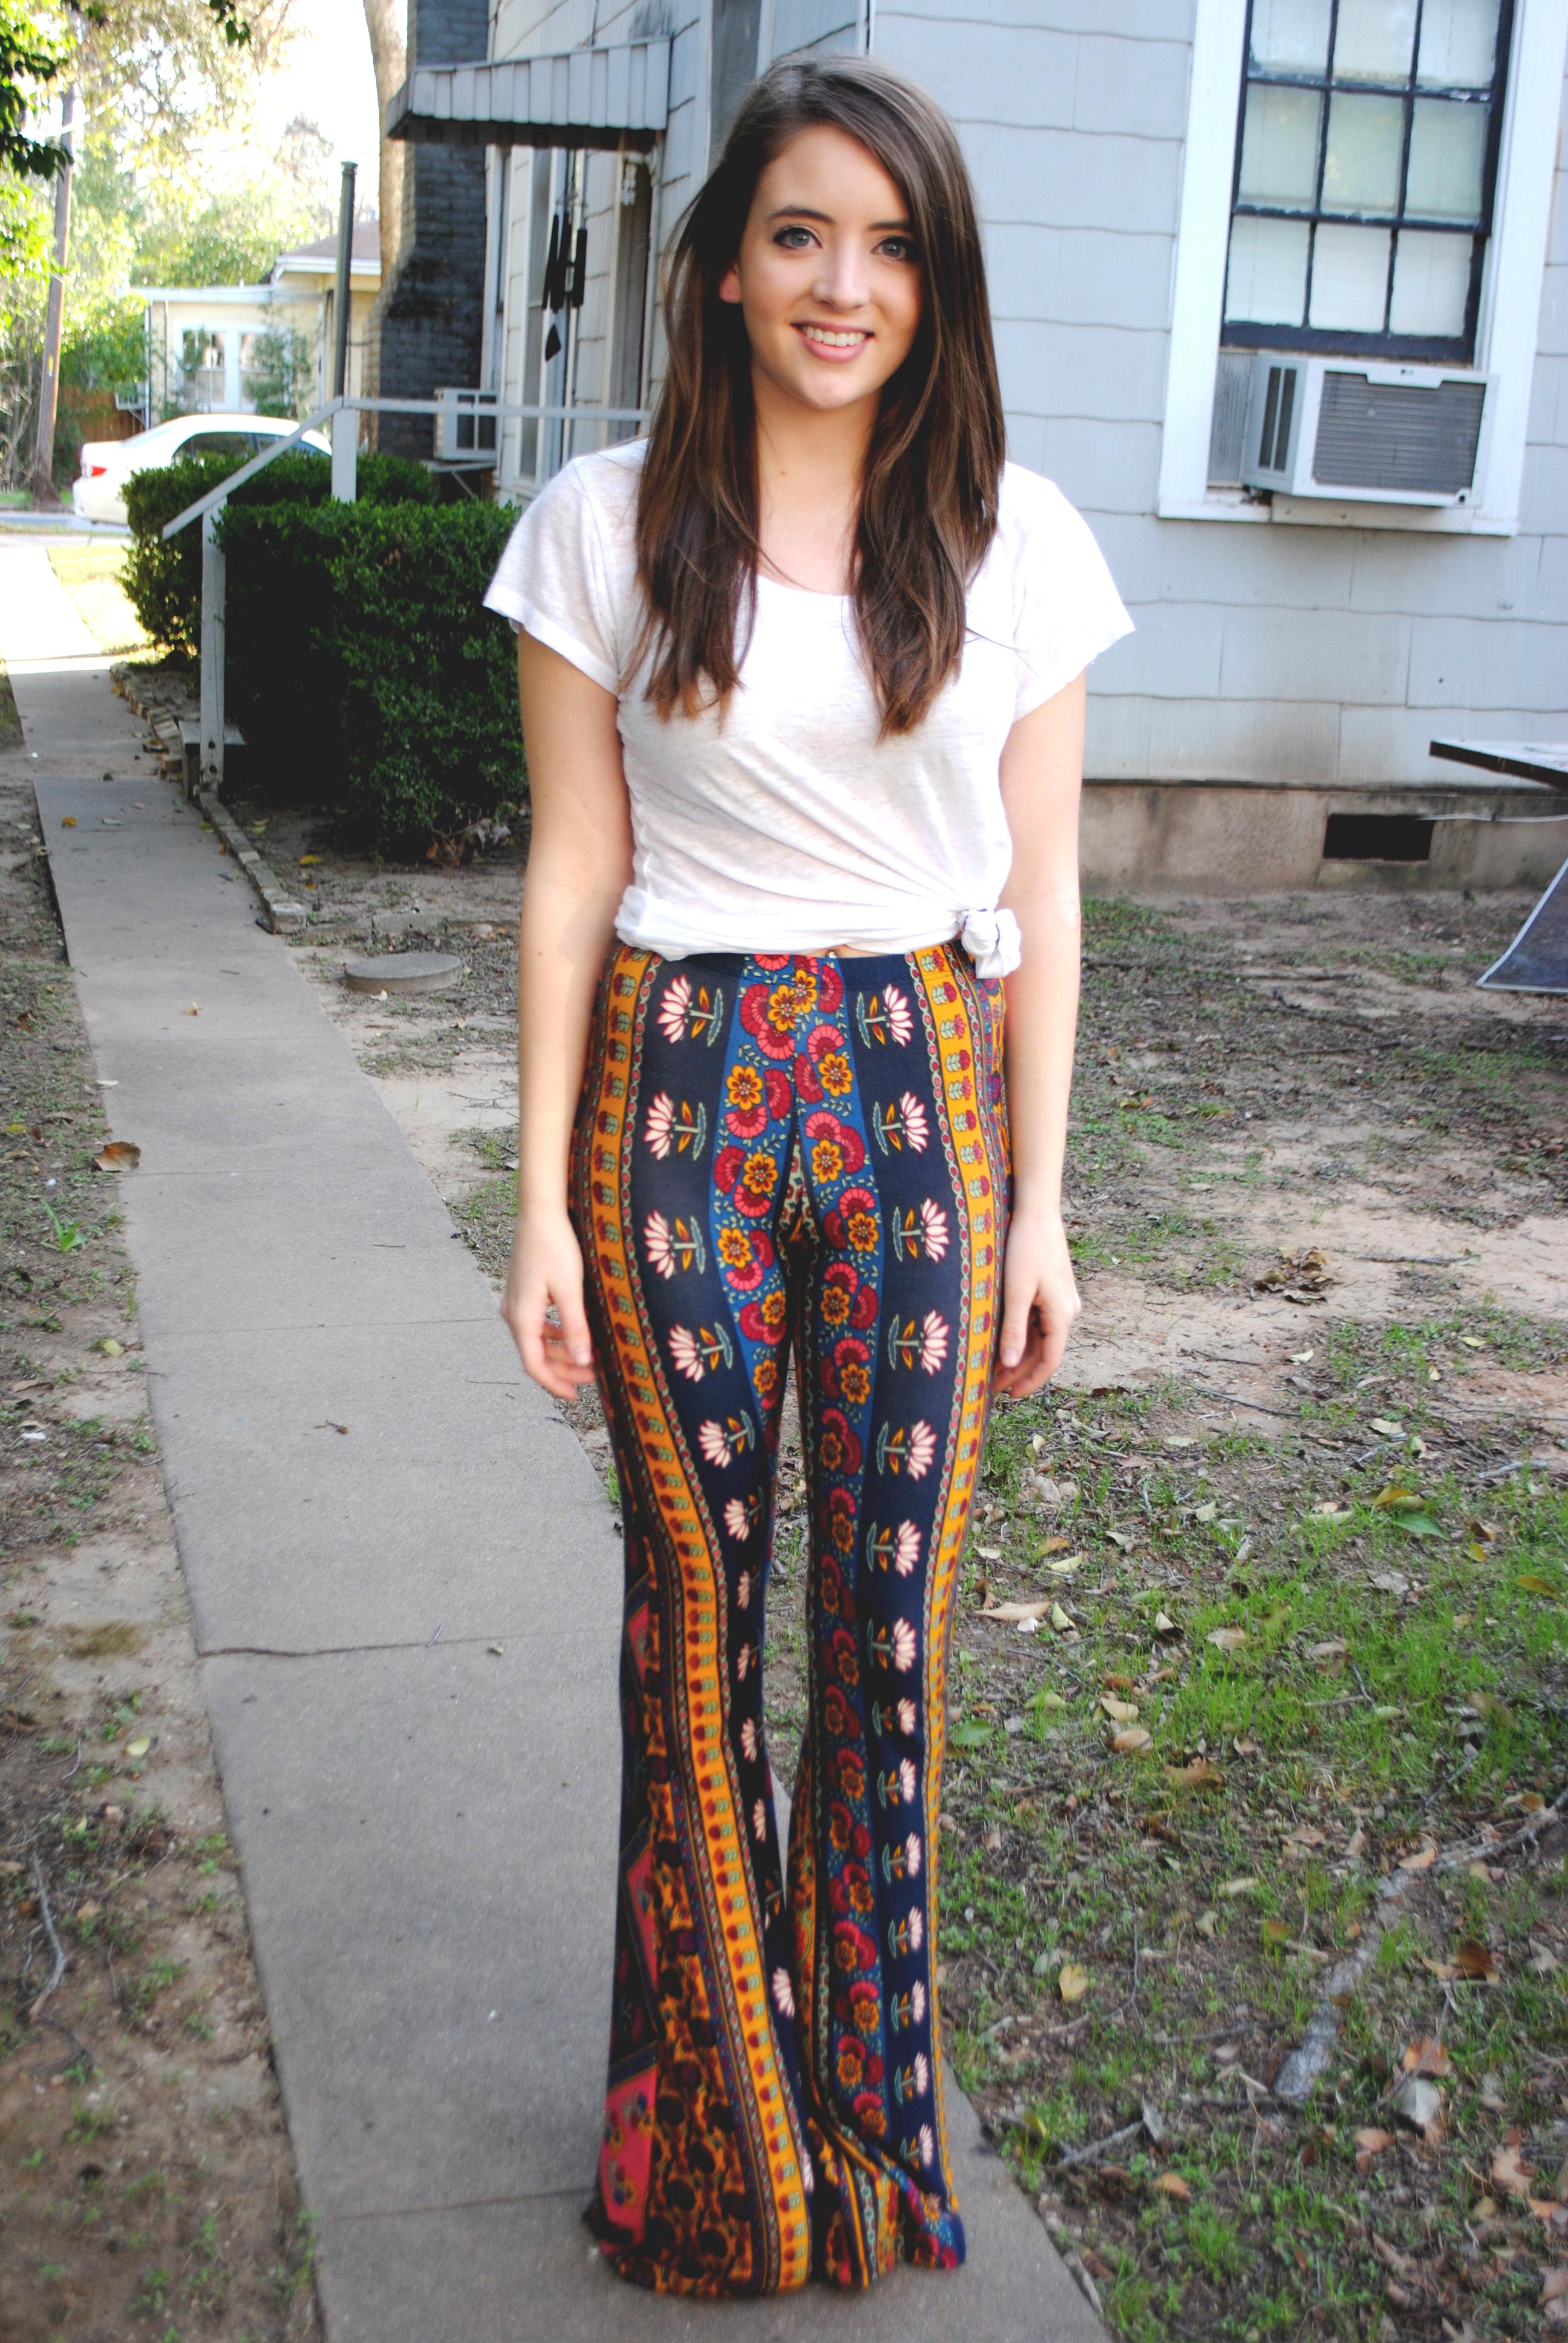 Kelly Rector |http://kellyannscloset.blogspot.com/